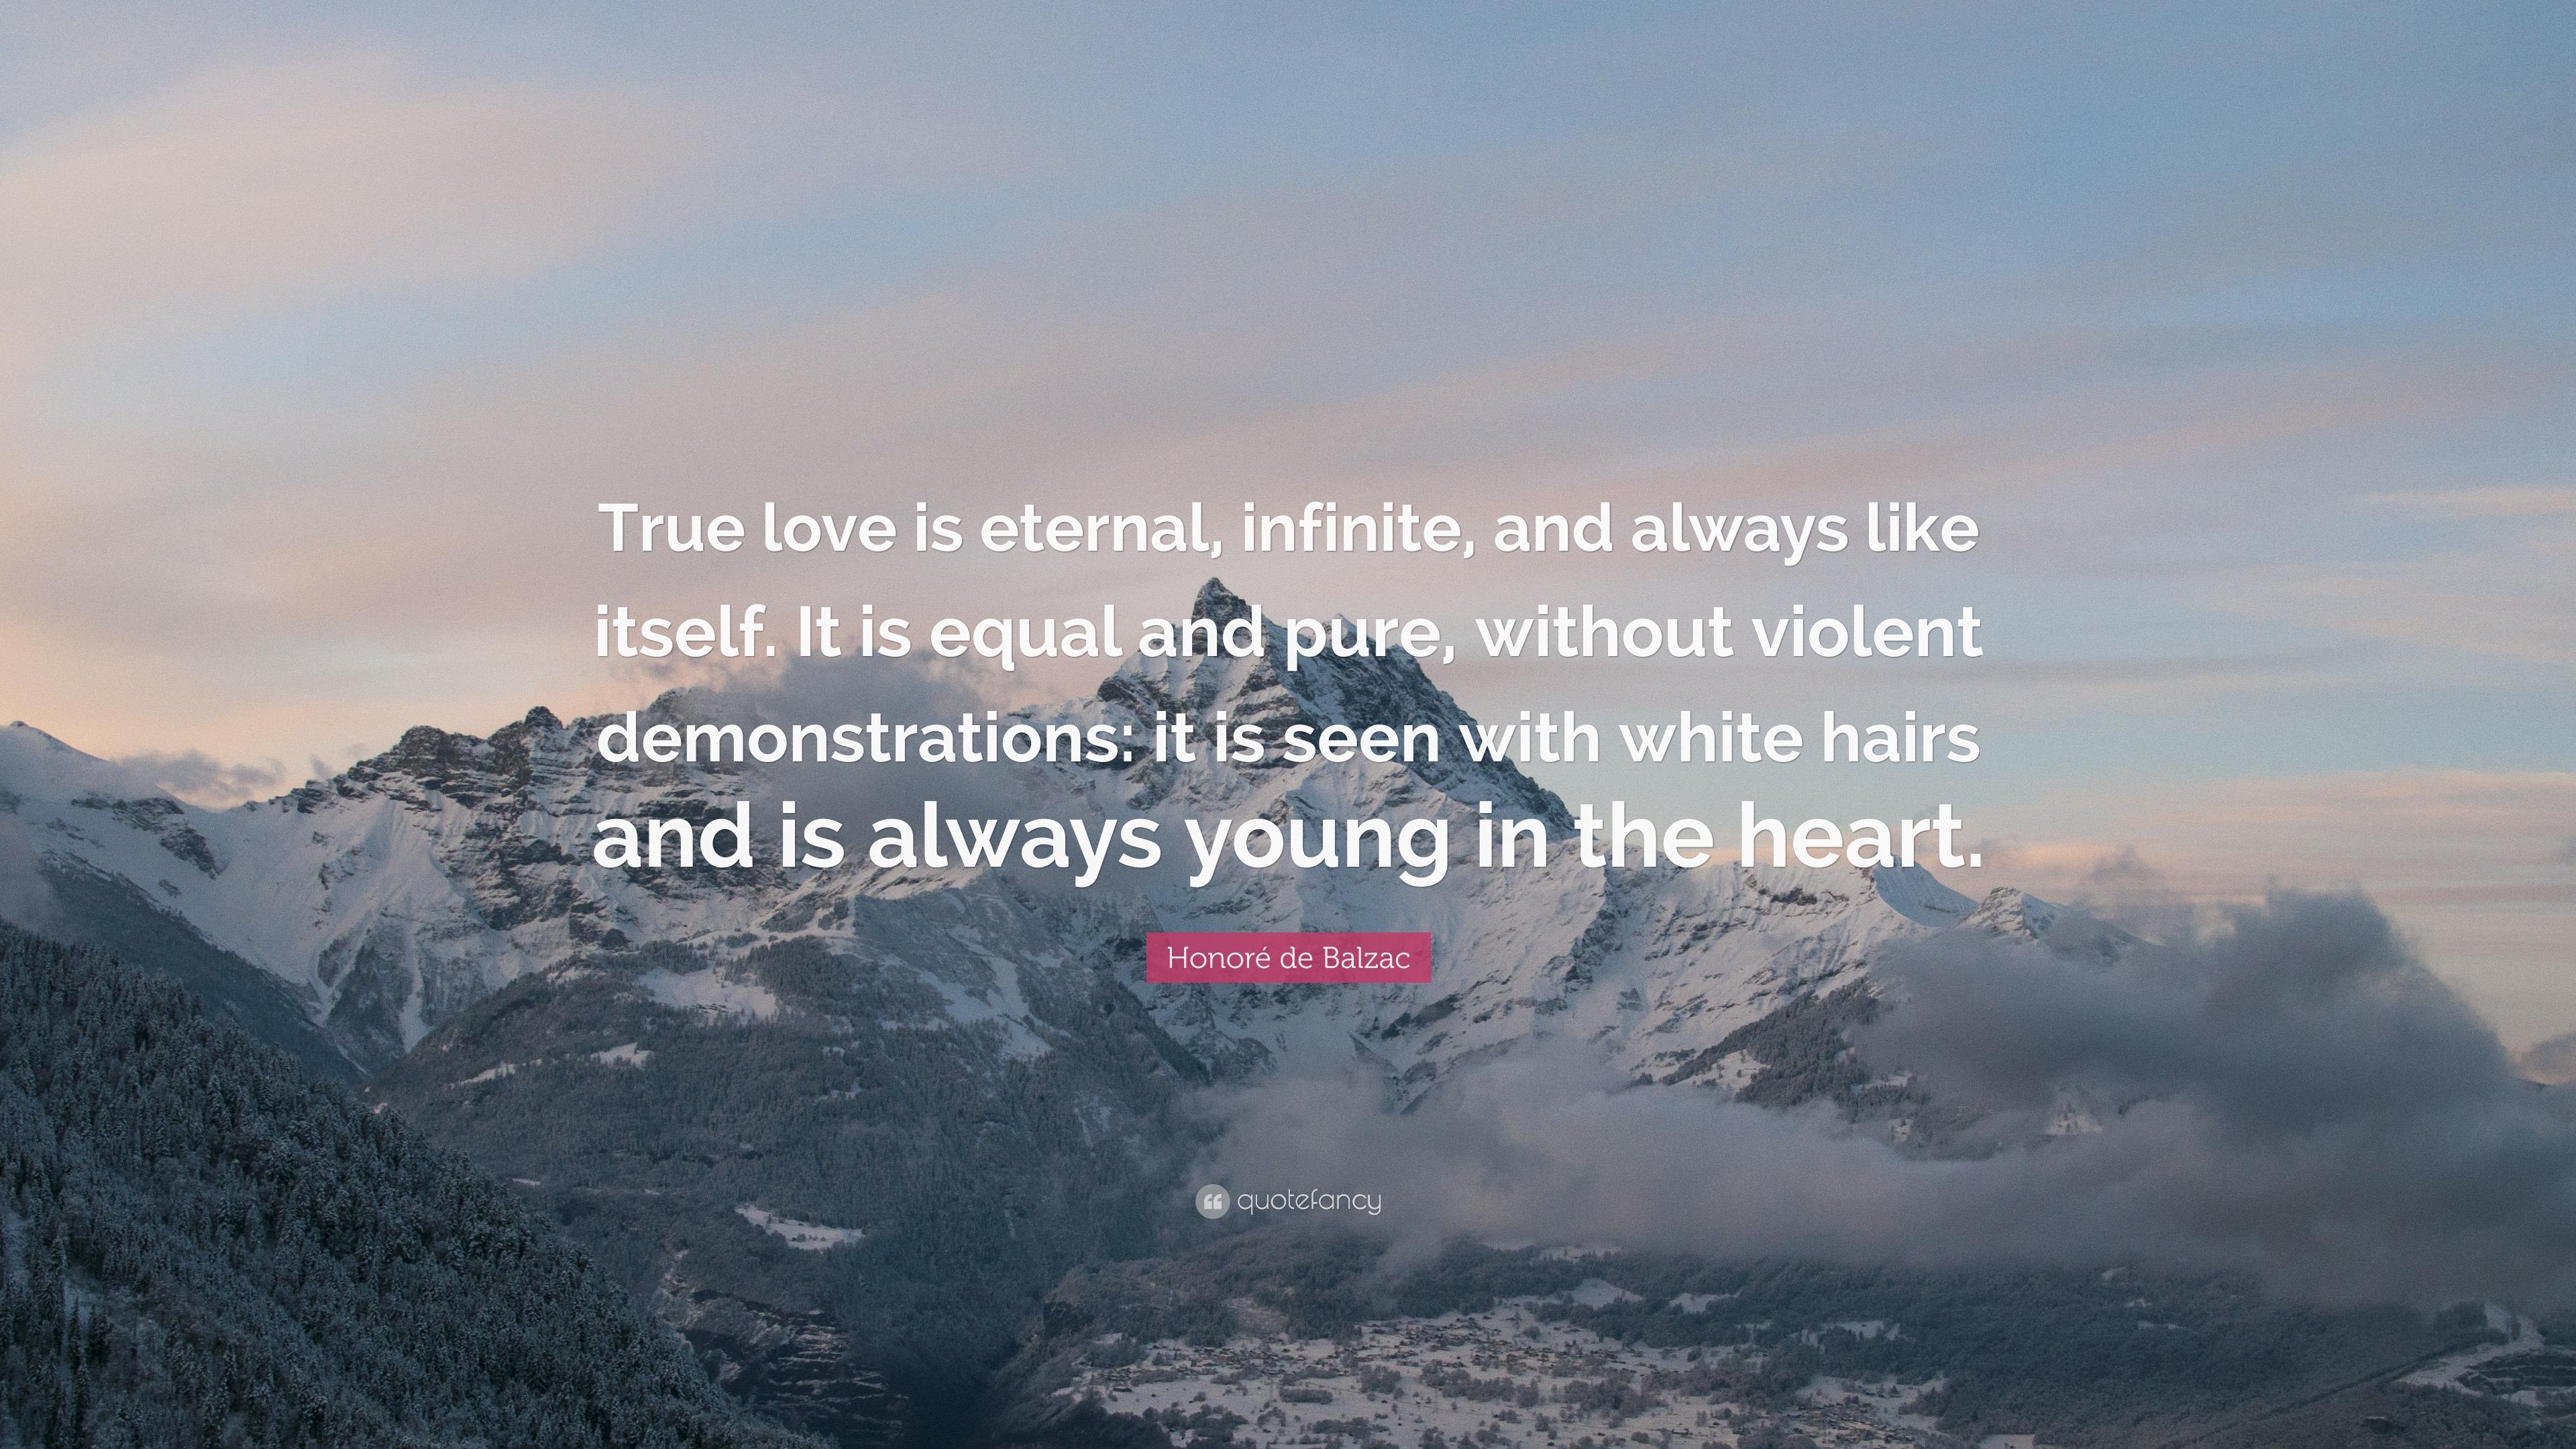 Honoré De Balzac Quote: U201cTrue Love Is Eternal, Infinite, And Always Like